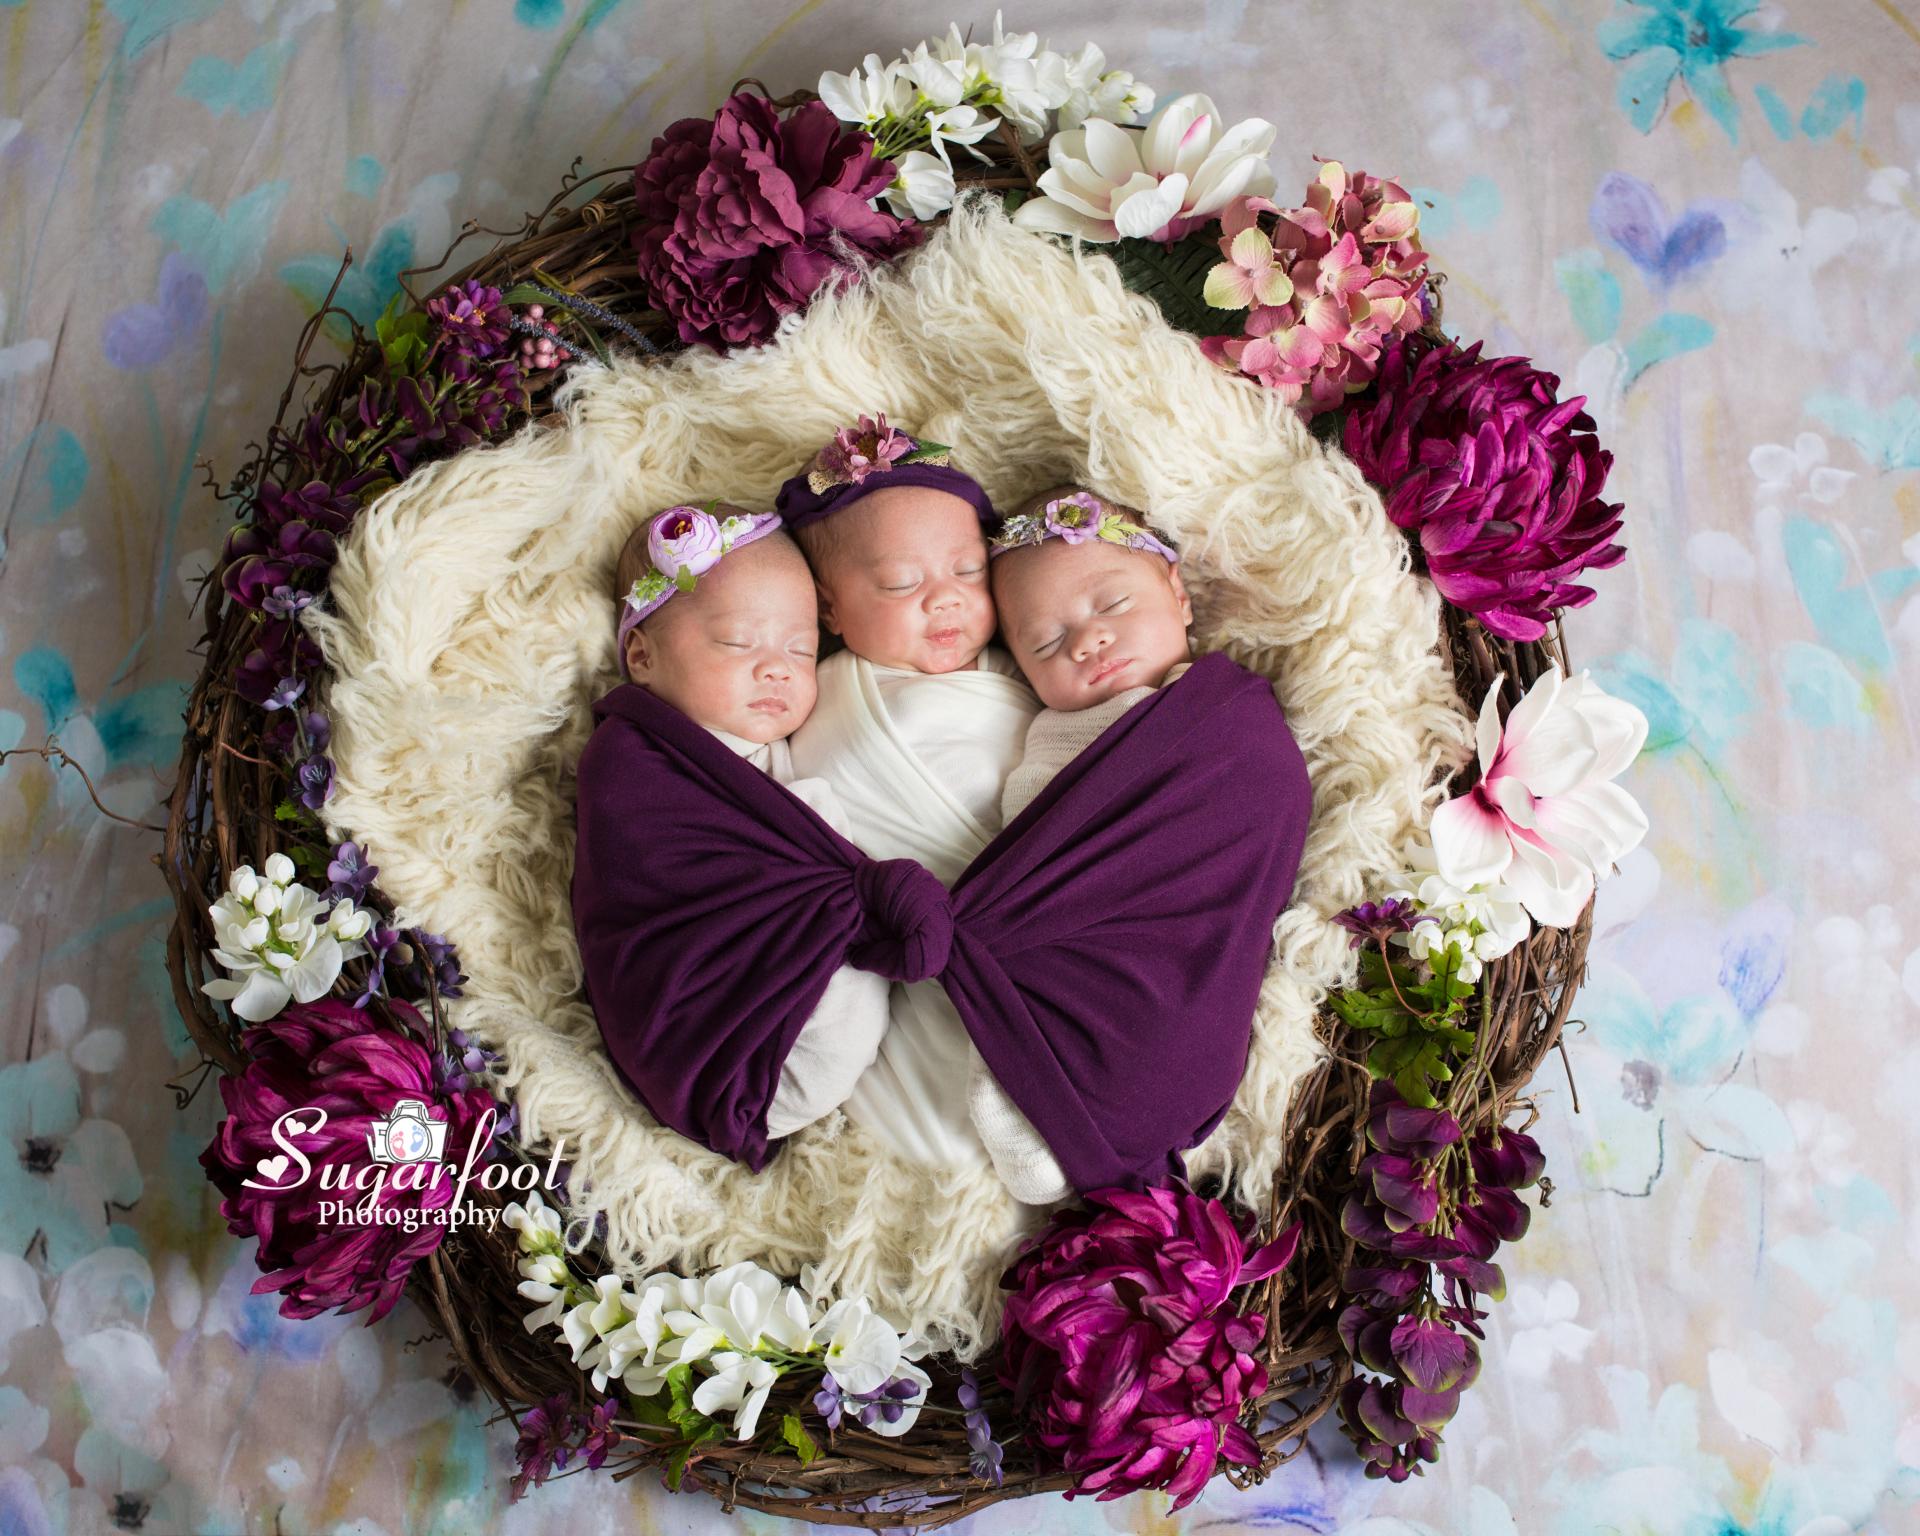 stl_newborn_baby_photographer_maternity_photographer_cardinals_blues